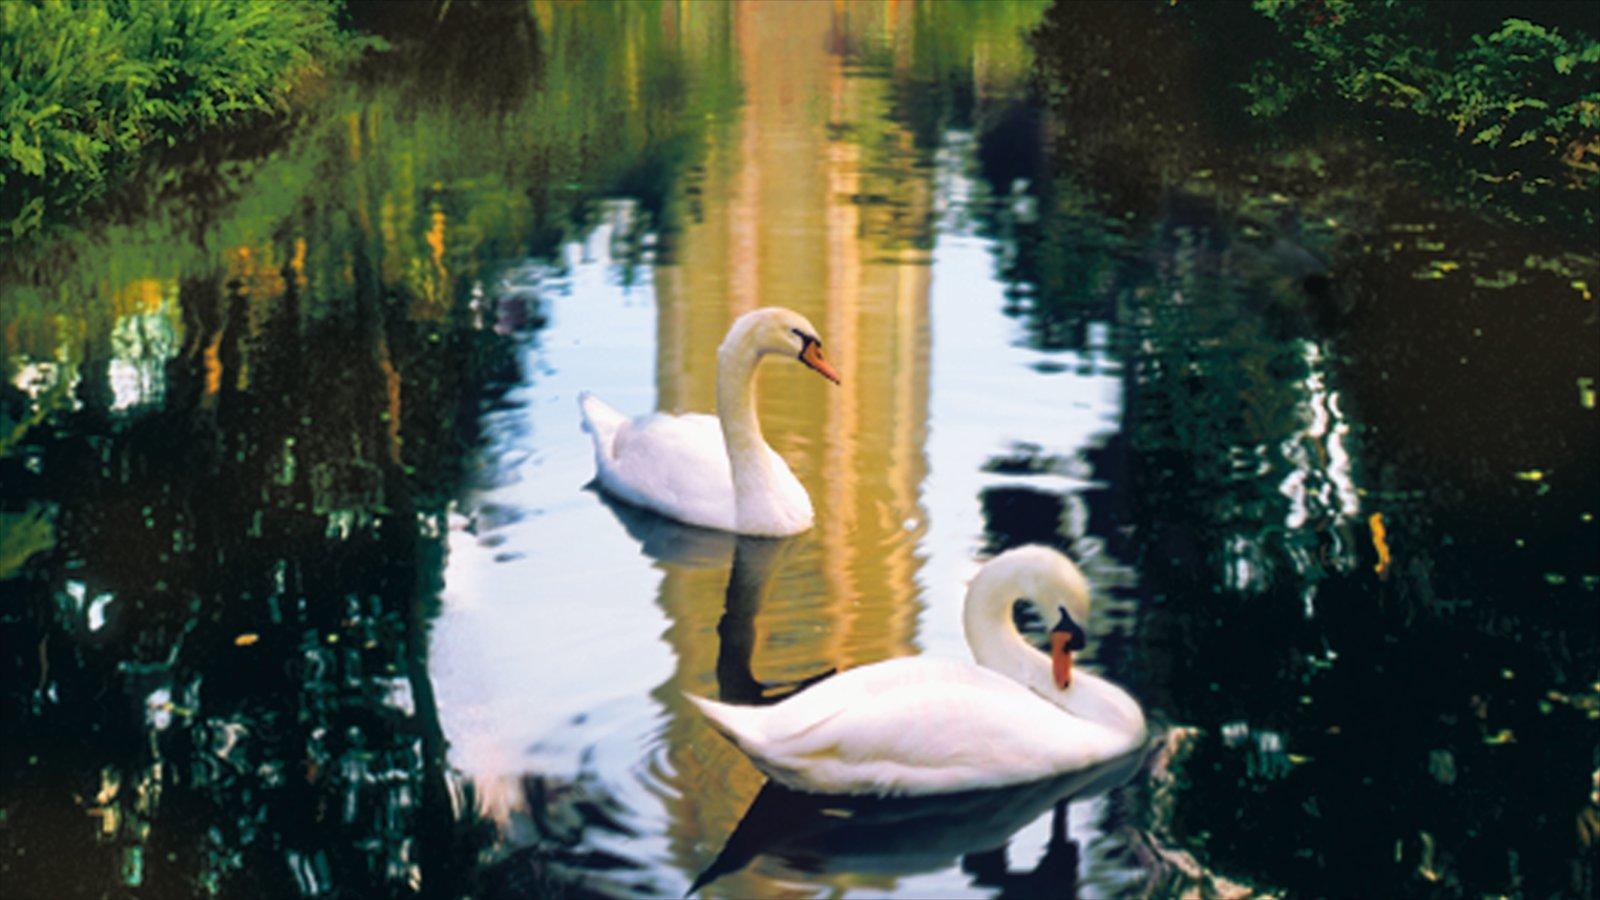 Lakeland - Winter Haven showing a lake or waterhole and bird life